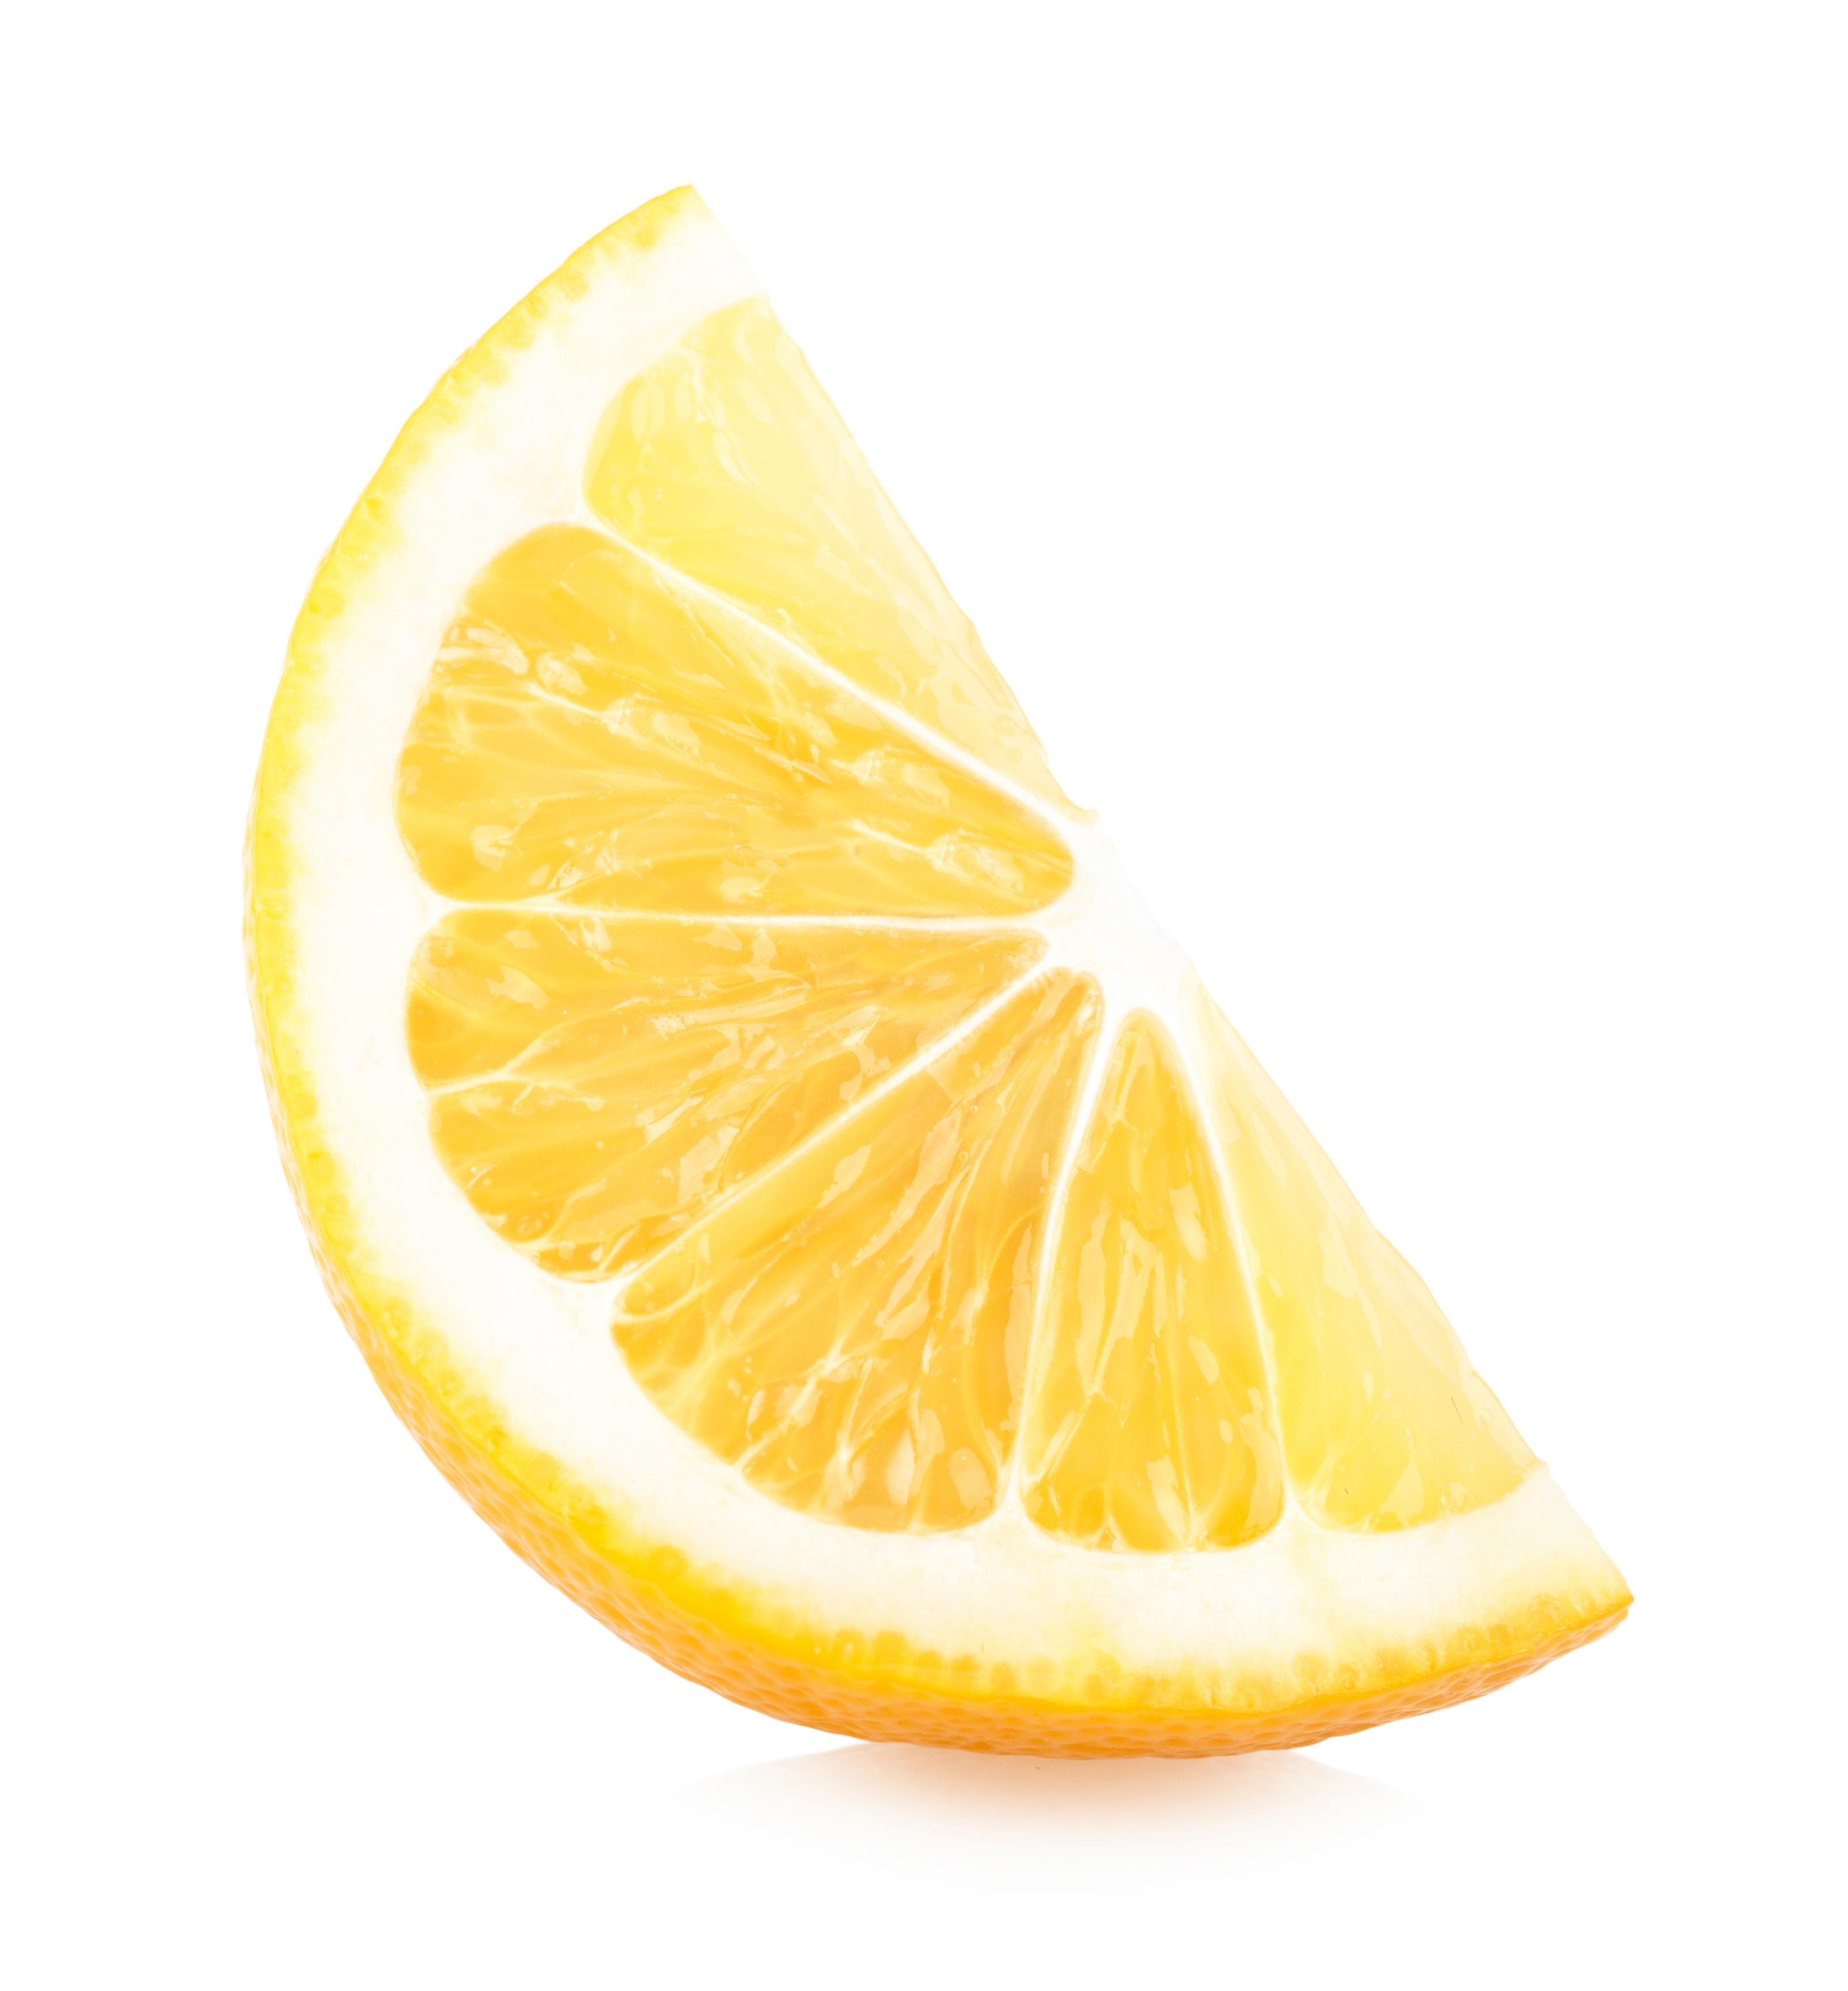 Lemon slice photo